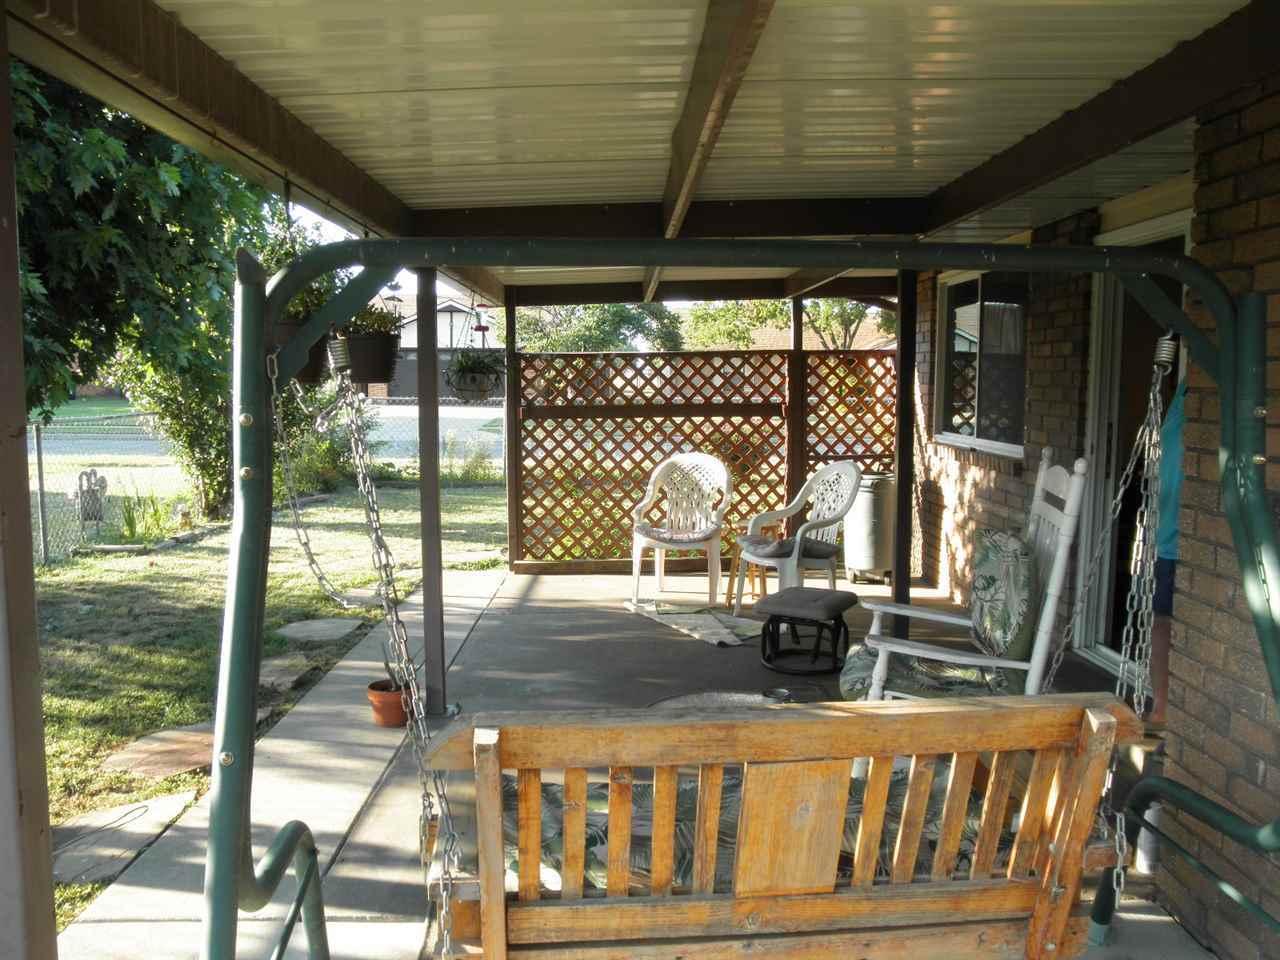 Sold Intraoffice W/MLS | 2520 Bonnie Ponca City, OK 74601 13